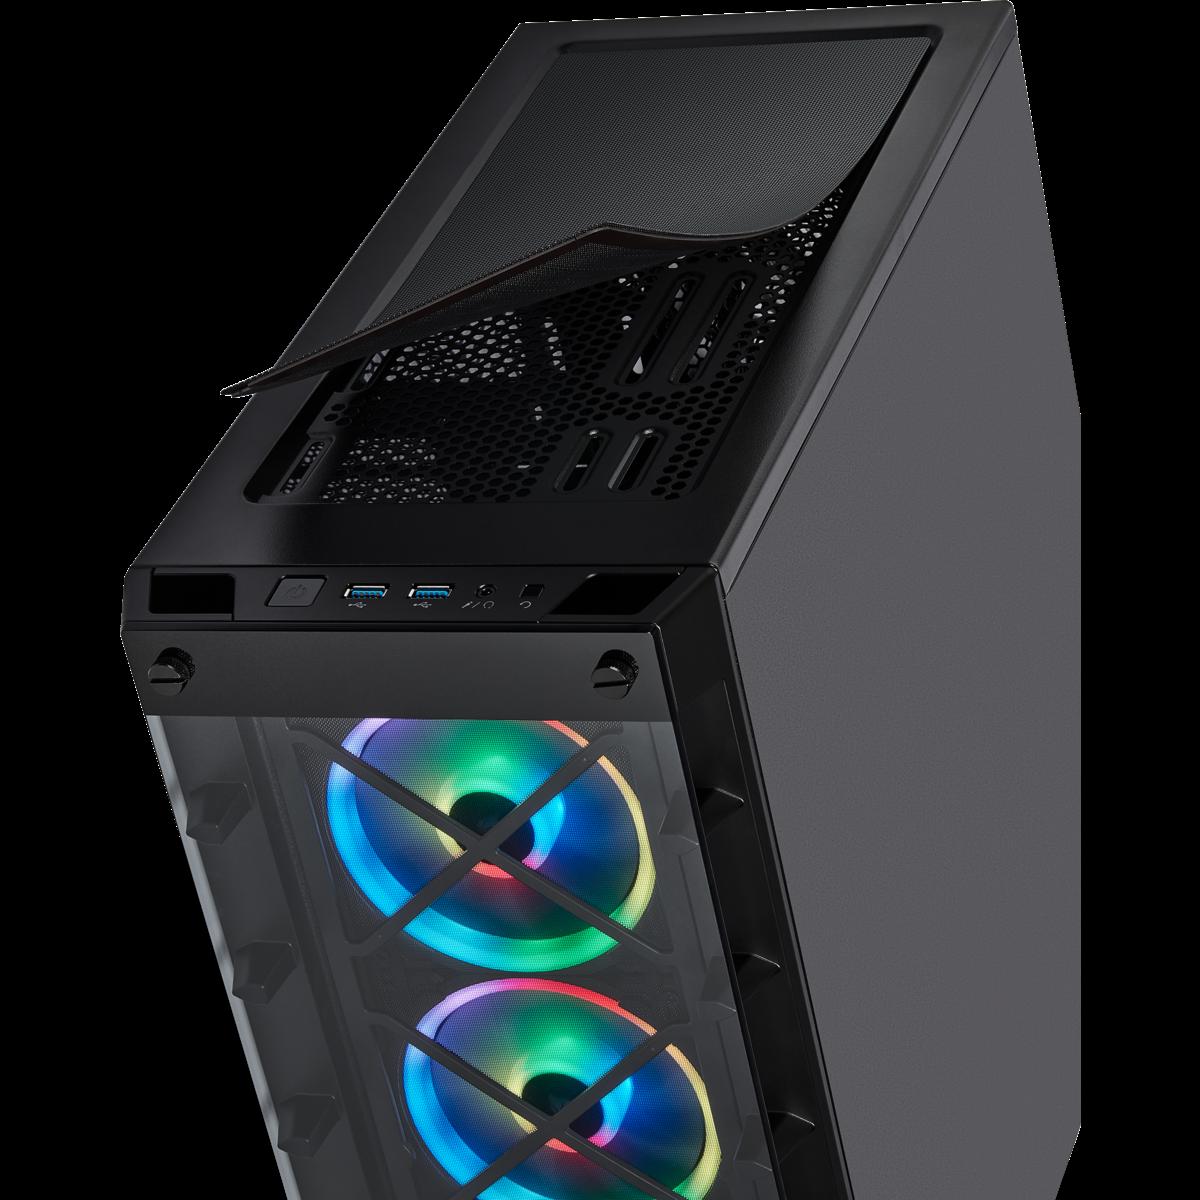 Gabinete Corsair 465X RGB Icue ATX Smart Case Black